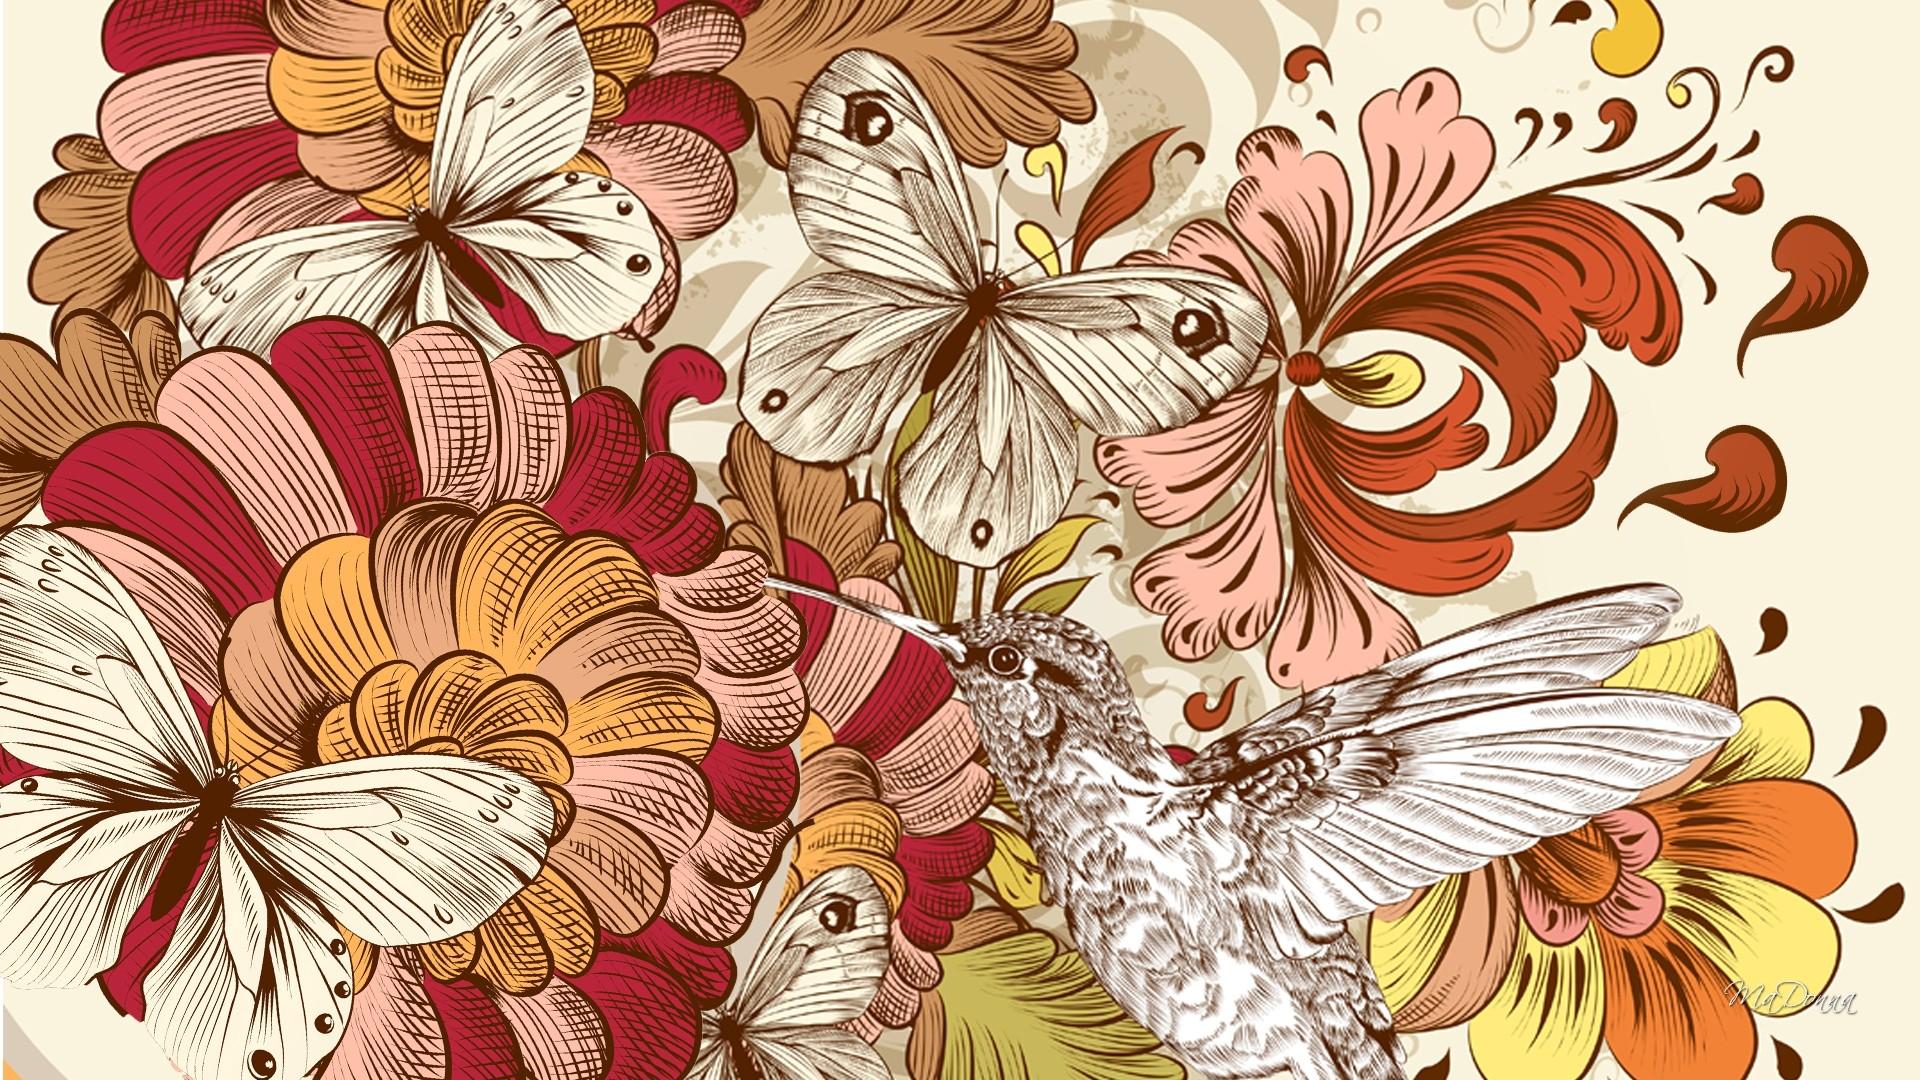 Desktop Wallpaper Vector 1080p Beautiful Widescreen , HD Wallpaper & Backgrounds